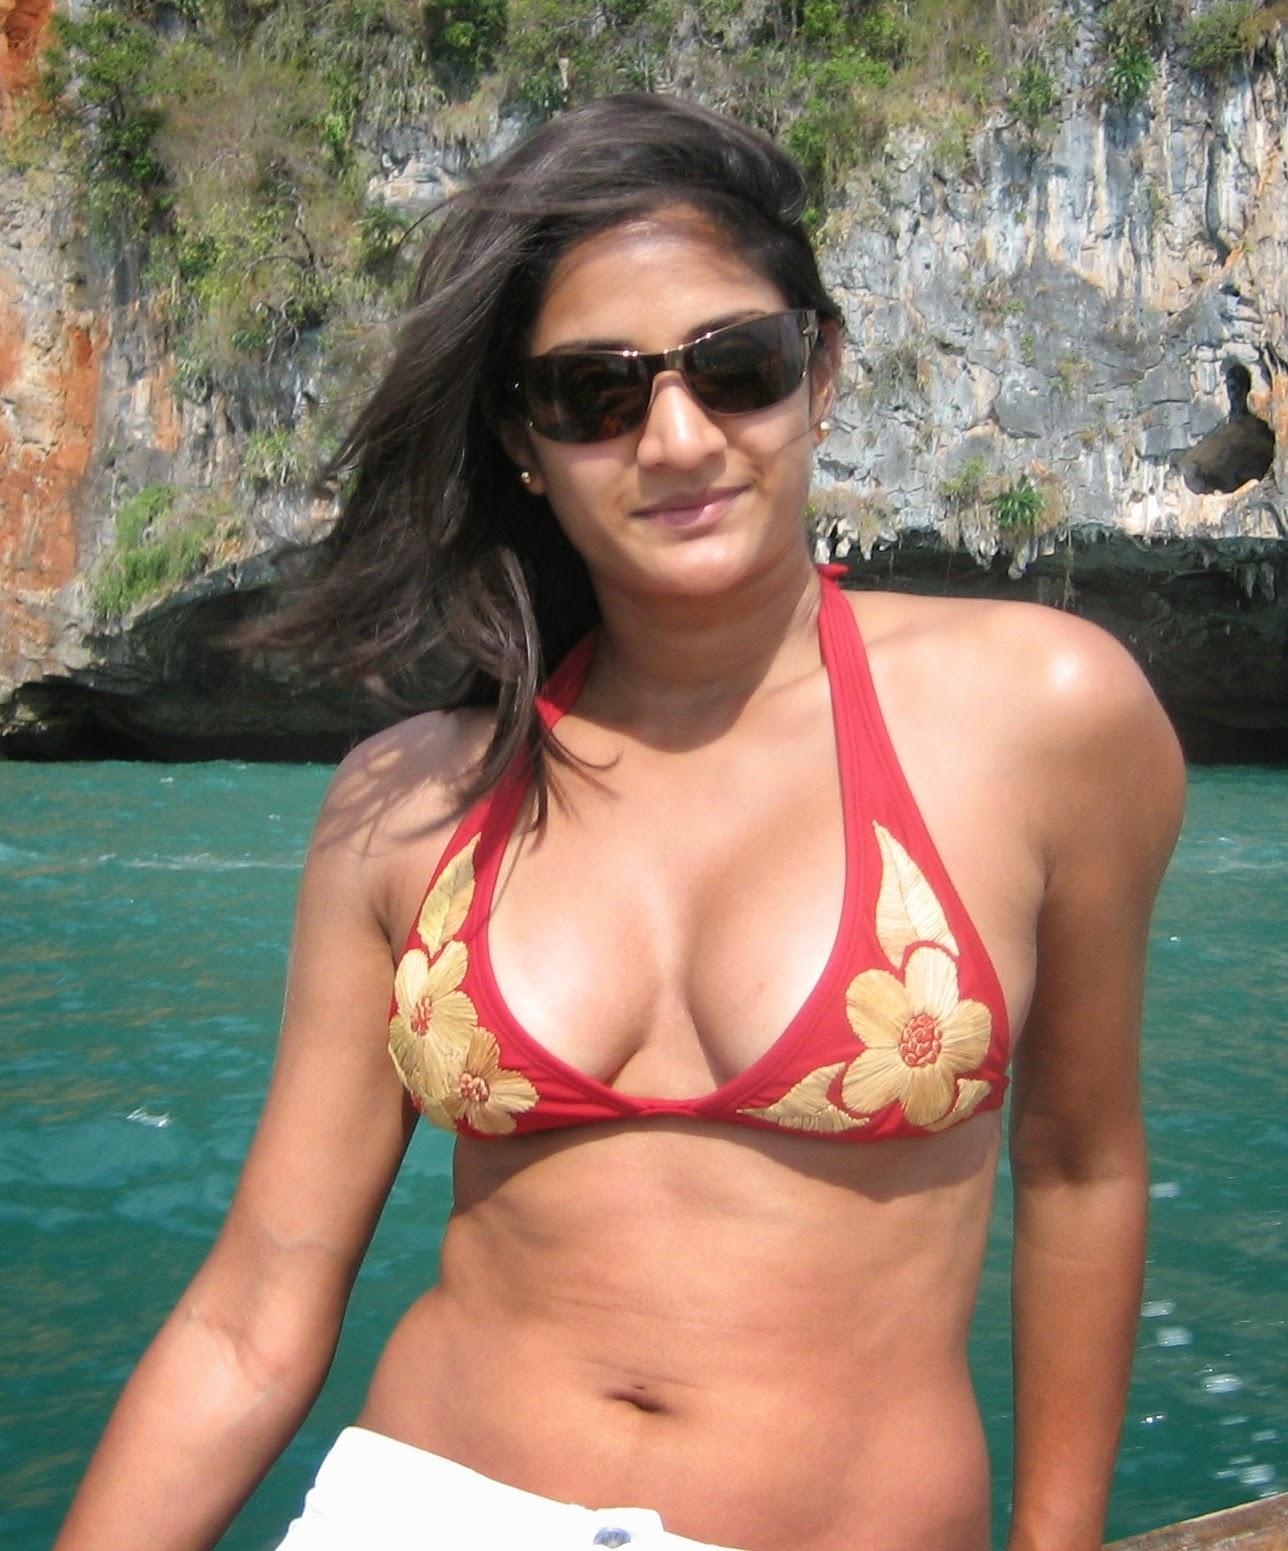 Sole naked girls of tamilnadu